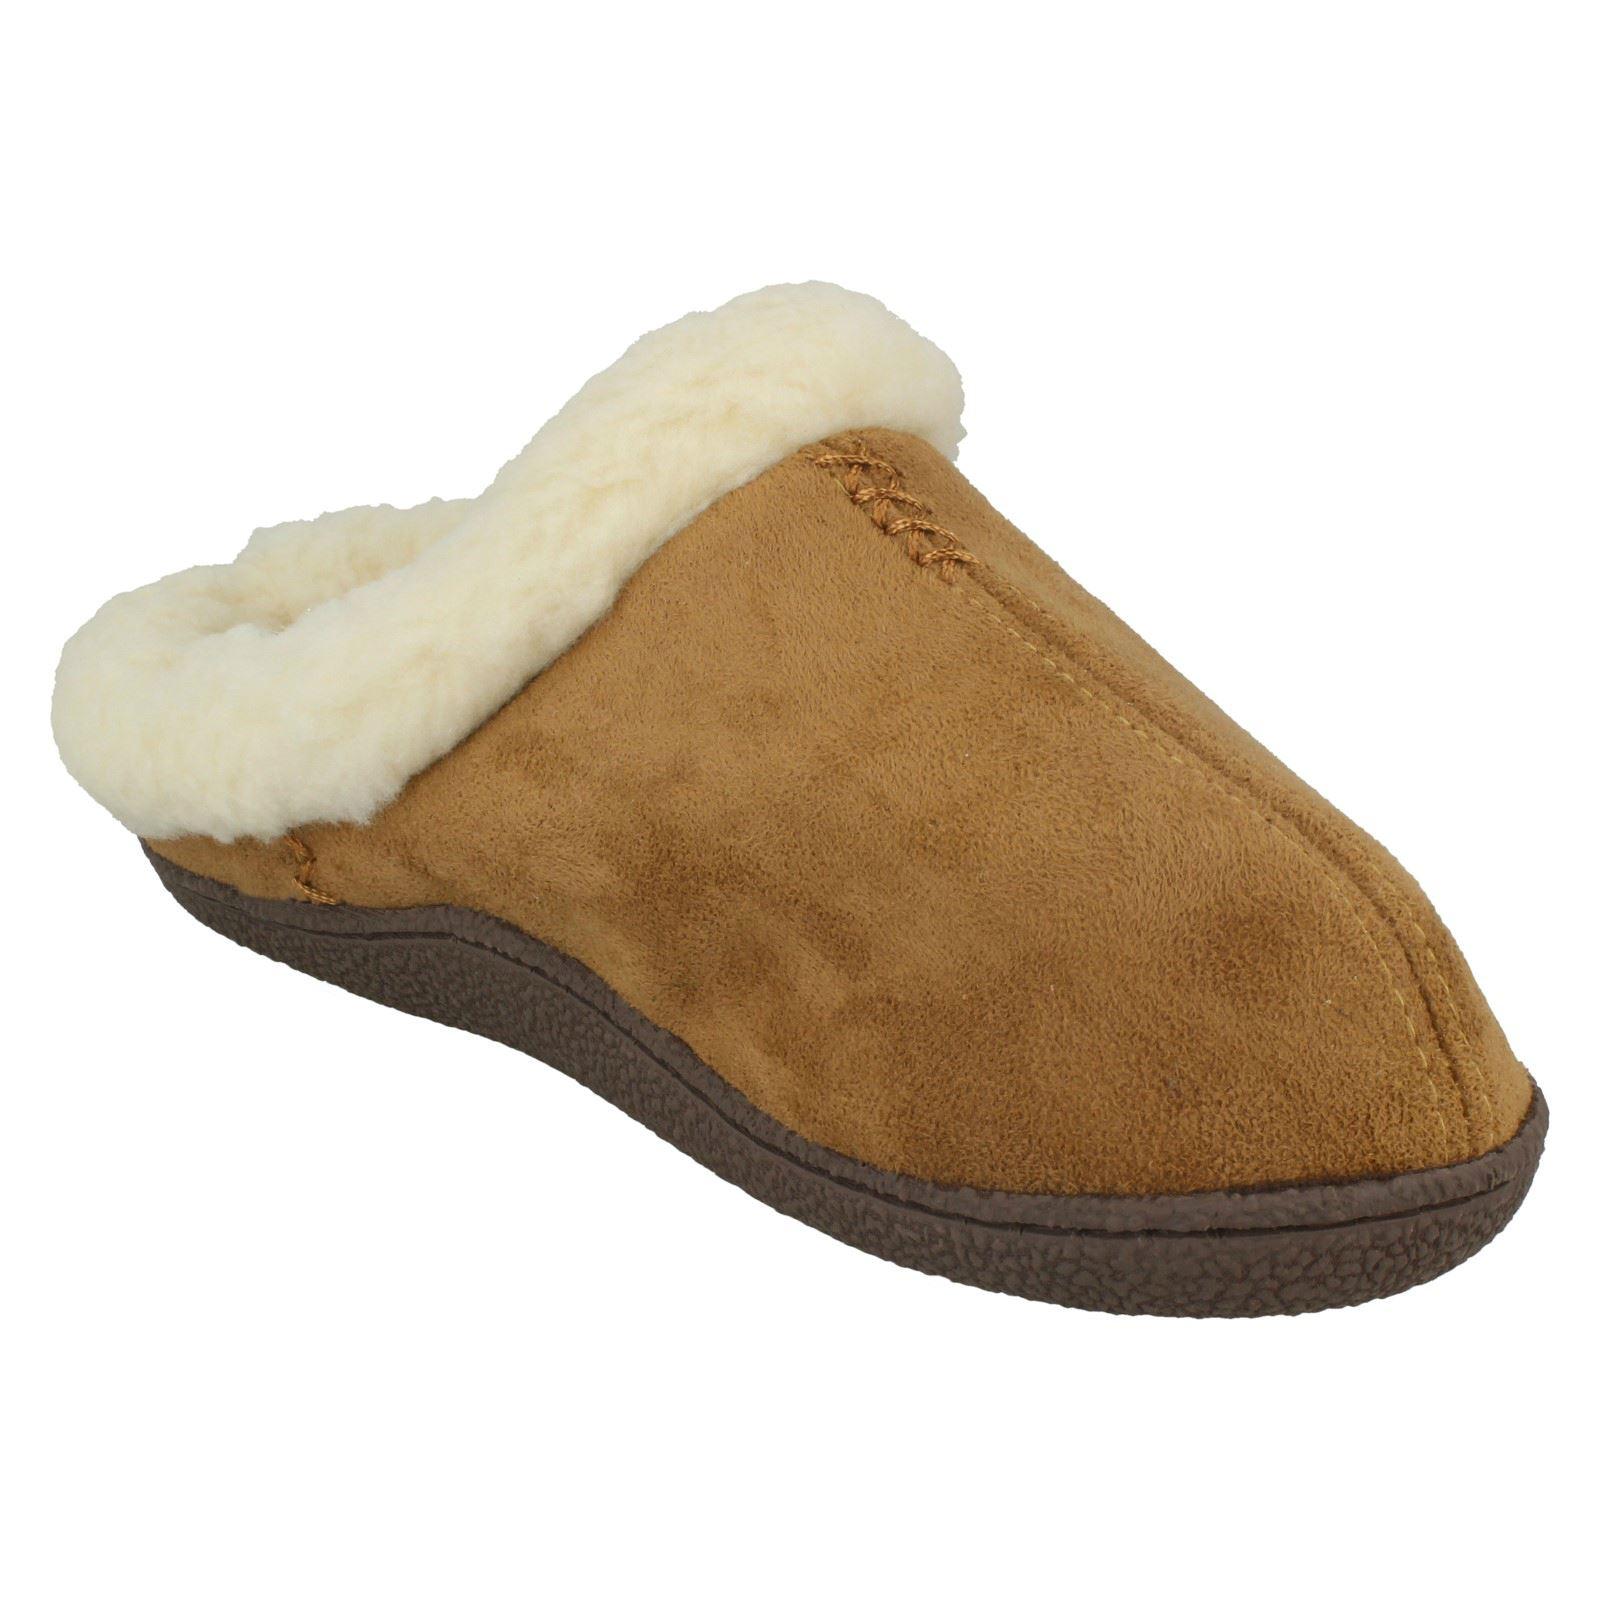 Zaxy NEW Start Blossom frost cream flower flat comfort ballet shoes sizes 3-8